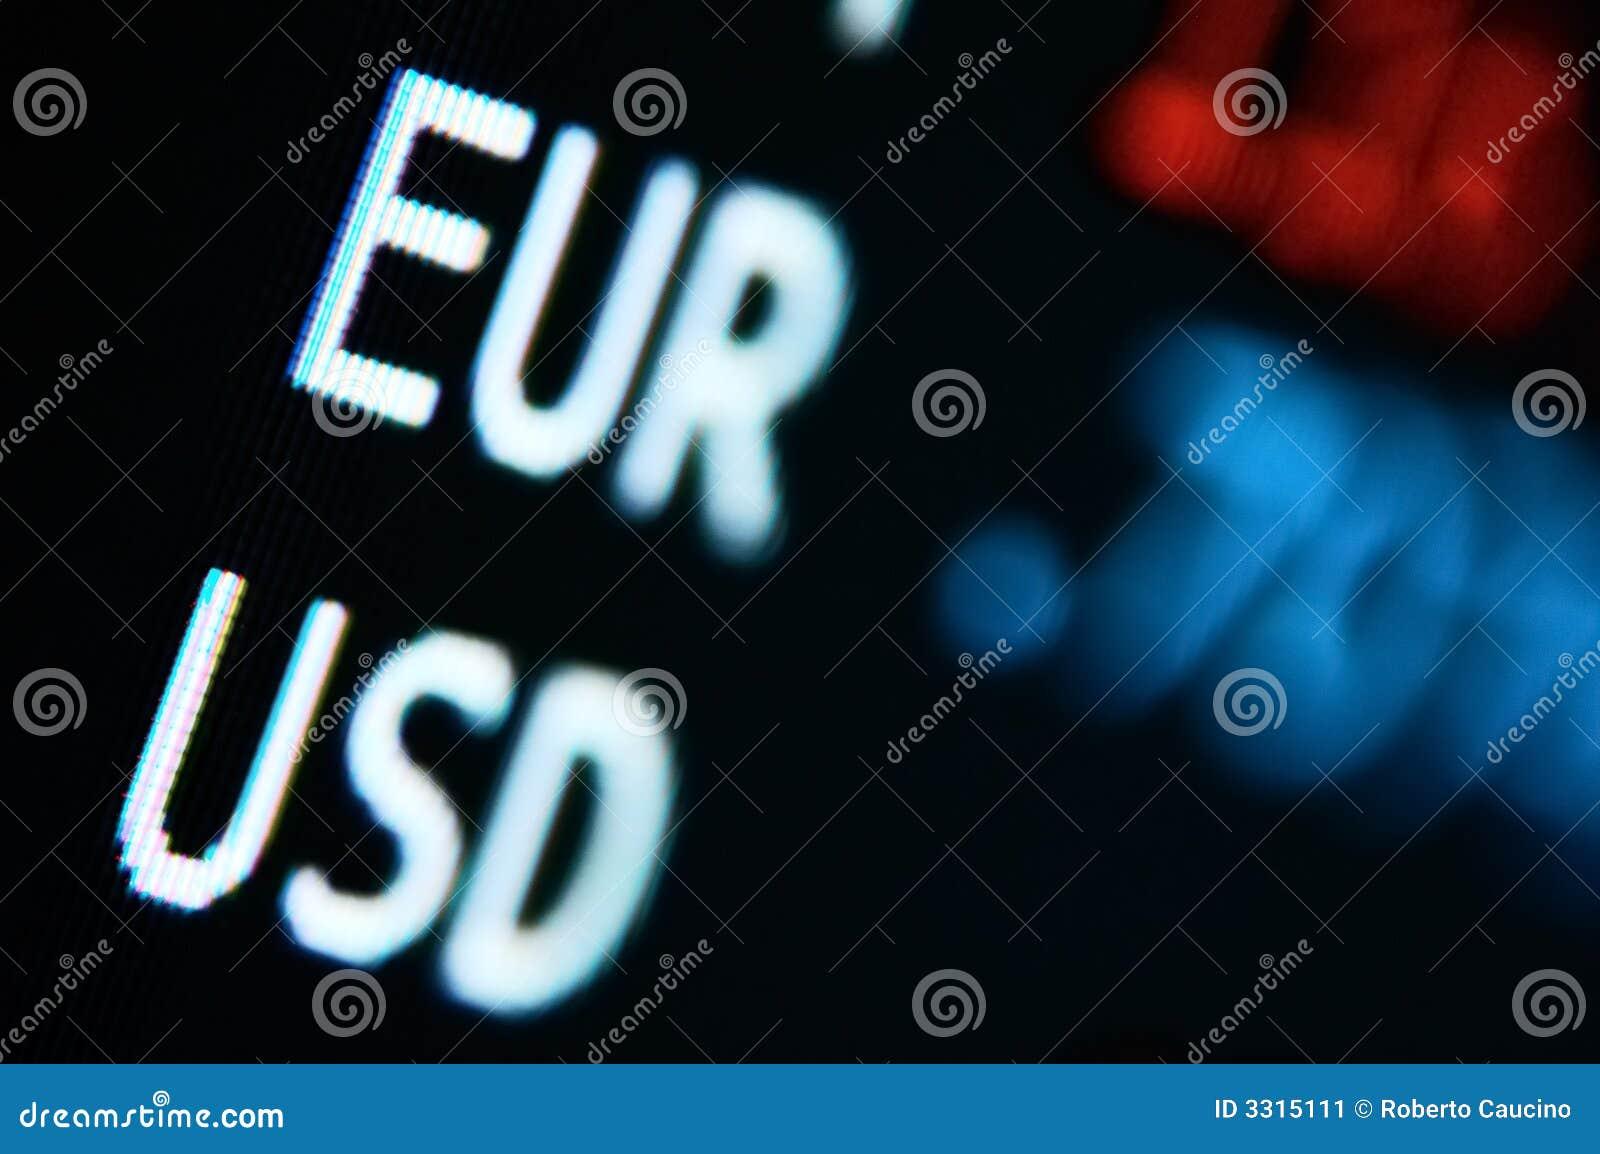 Exchange Rates stock image  Image of vision, dollar, cash - 3315111